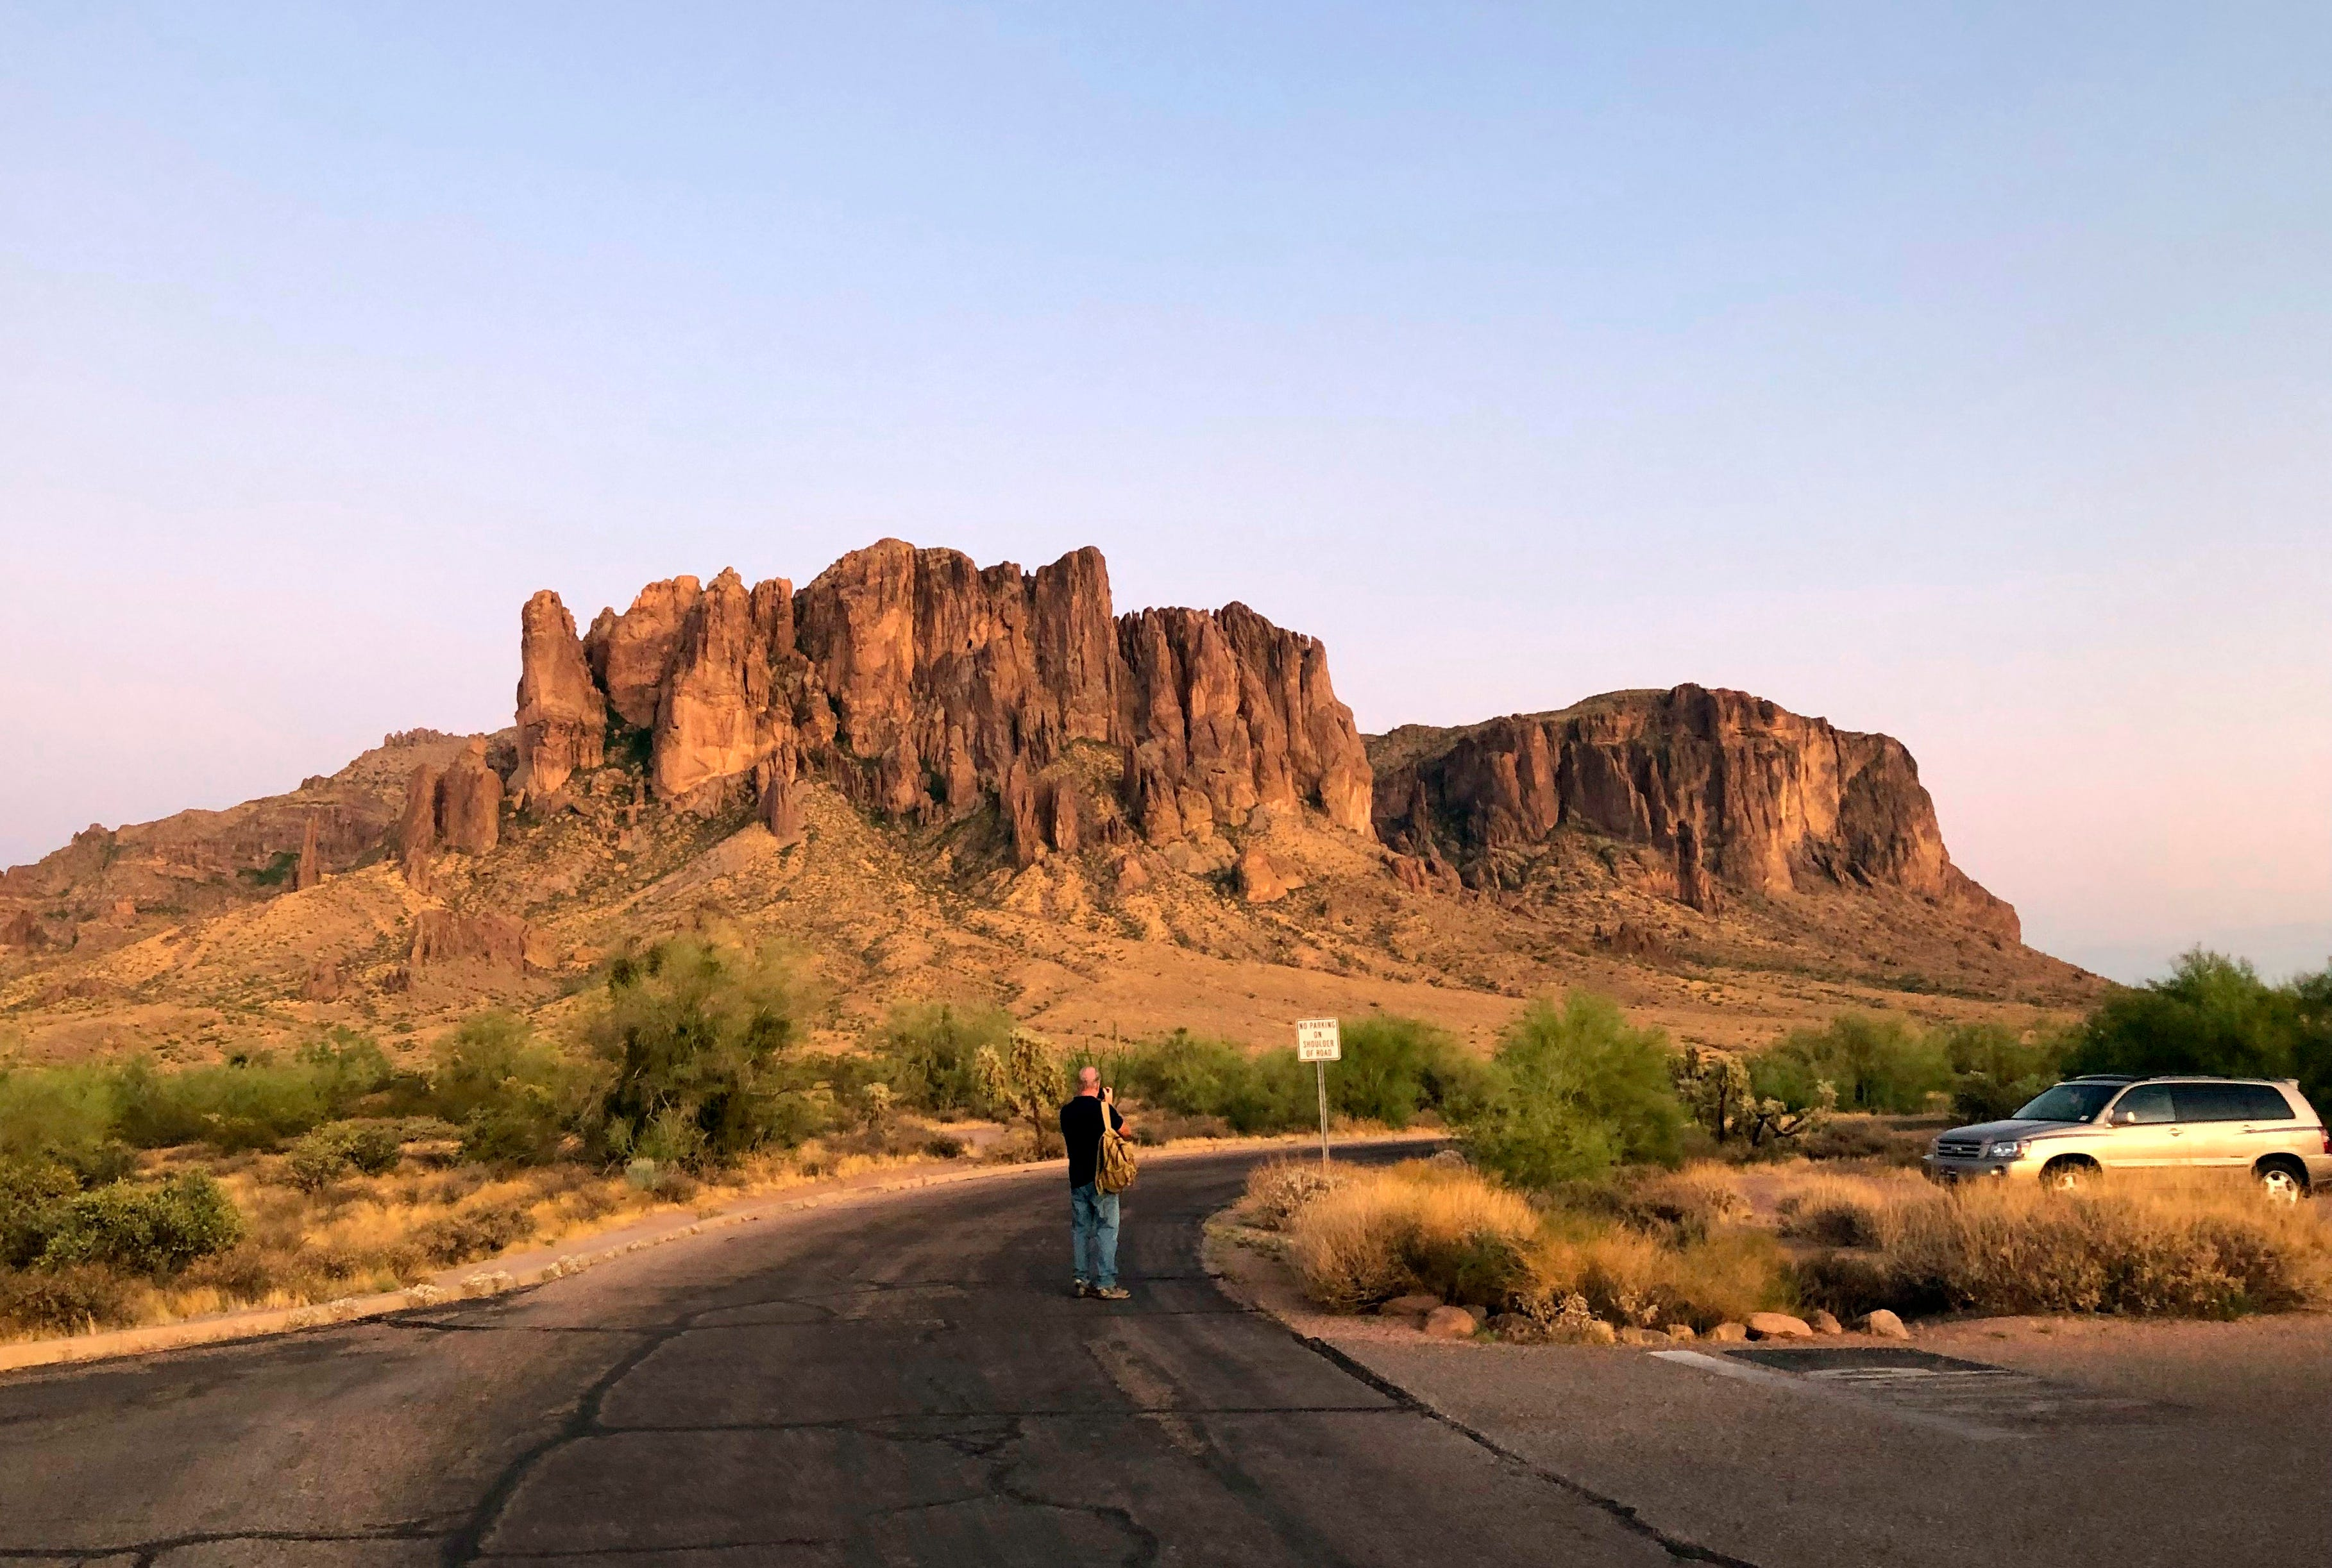 'I've got one!' What it's like to hunt neon scorpions in the Arizona desert